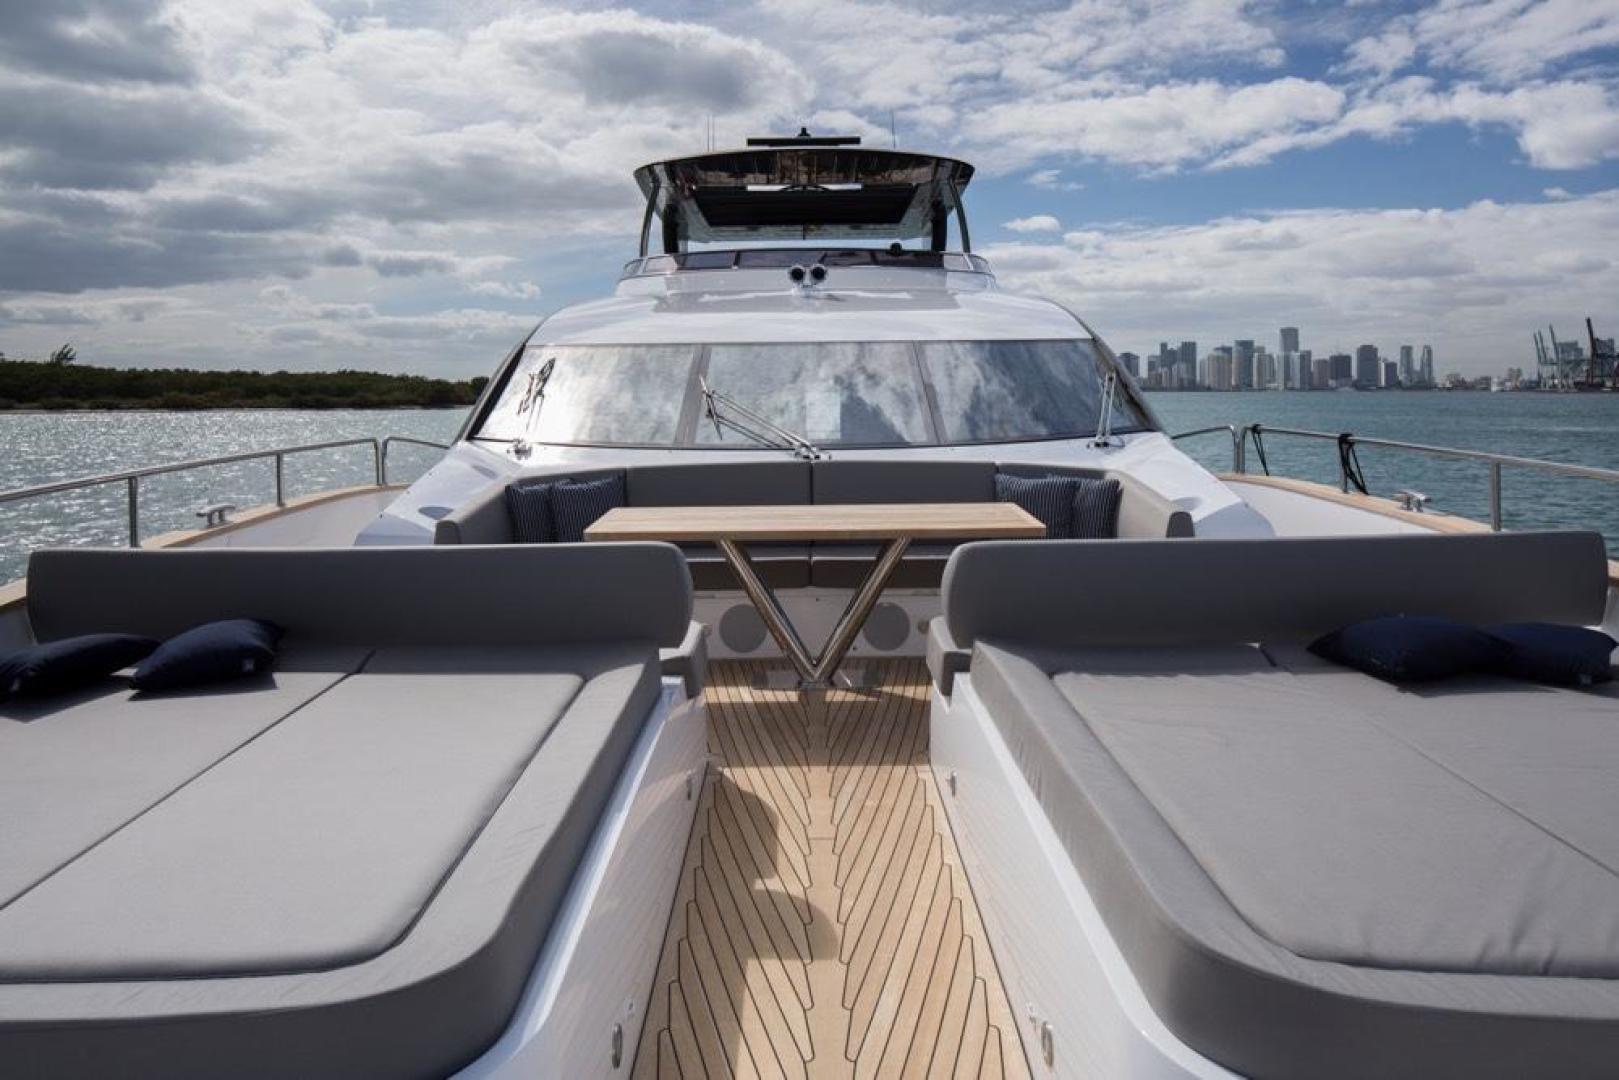 Sunseeker-28 Metre Yacht 2016-RIII Miami-Florida-United States-600088 | Thumbnail